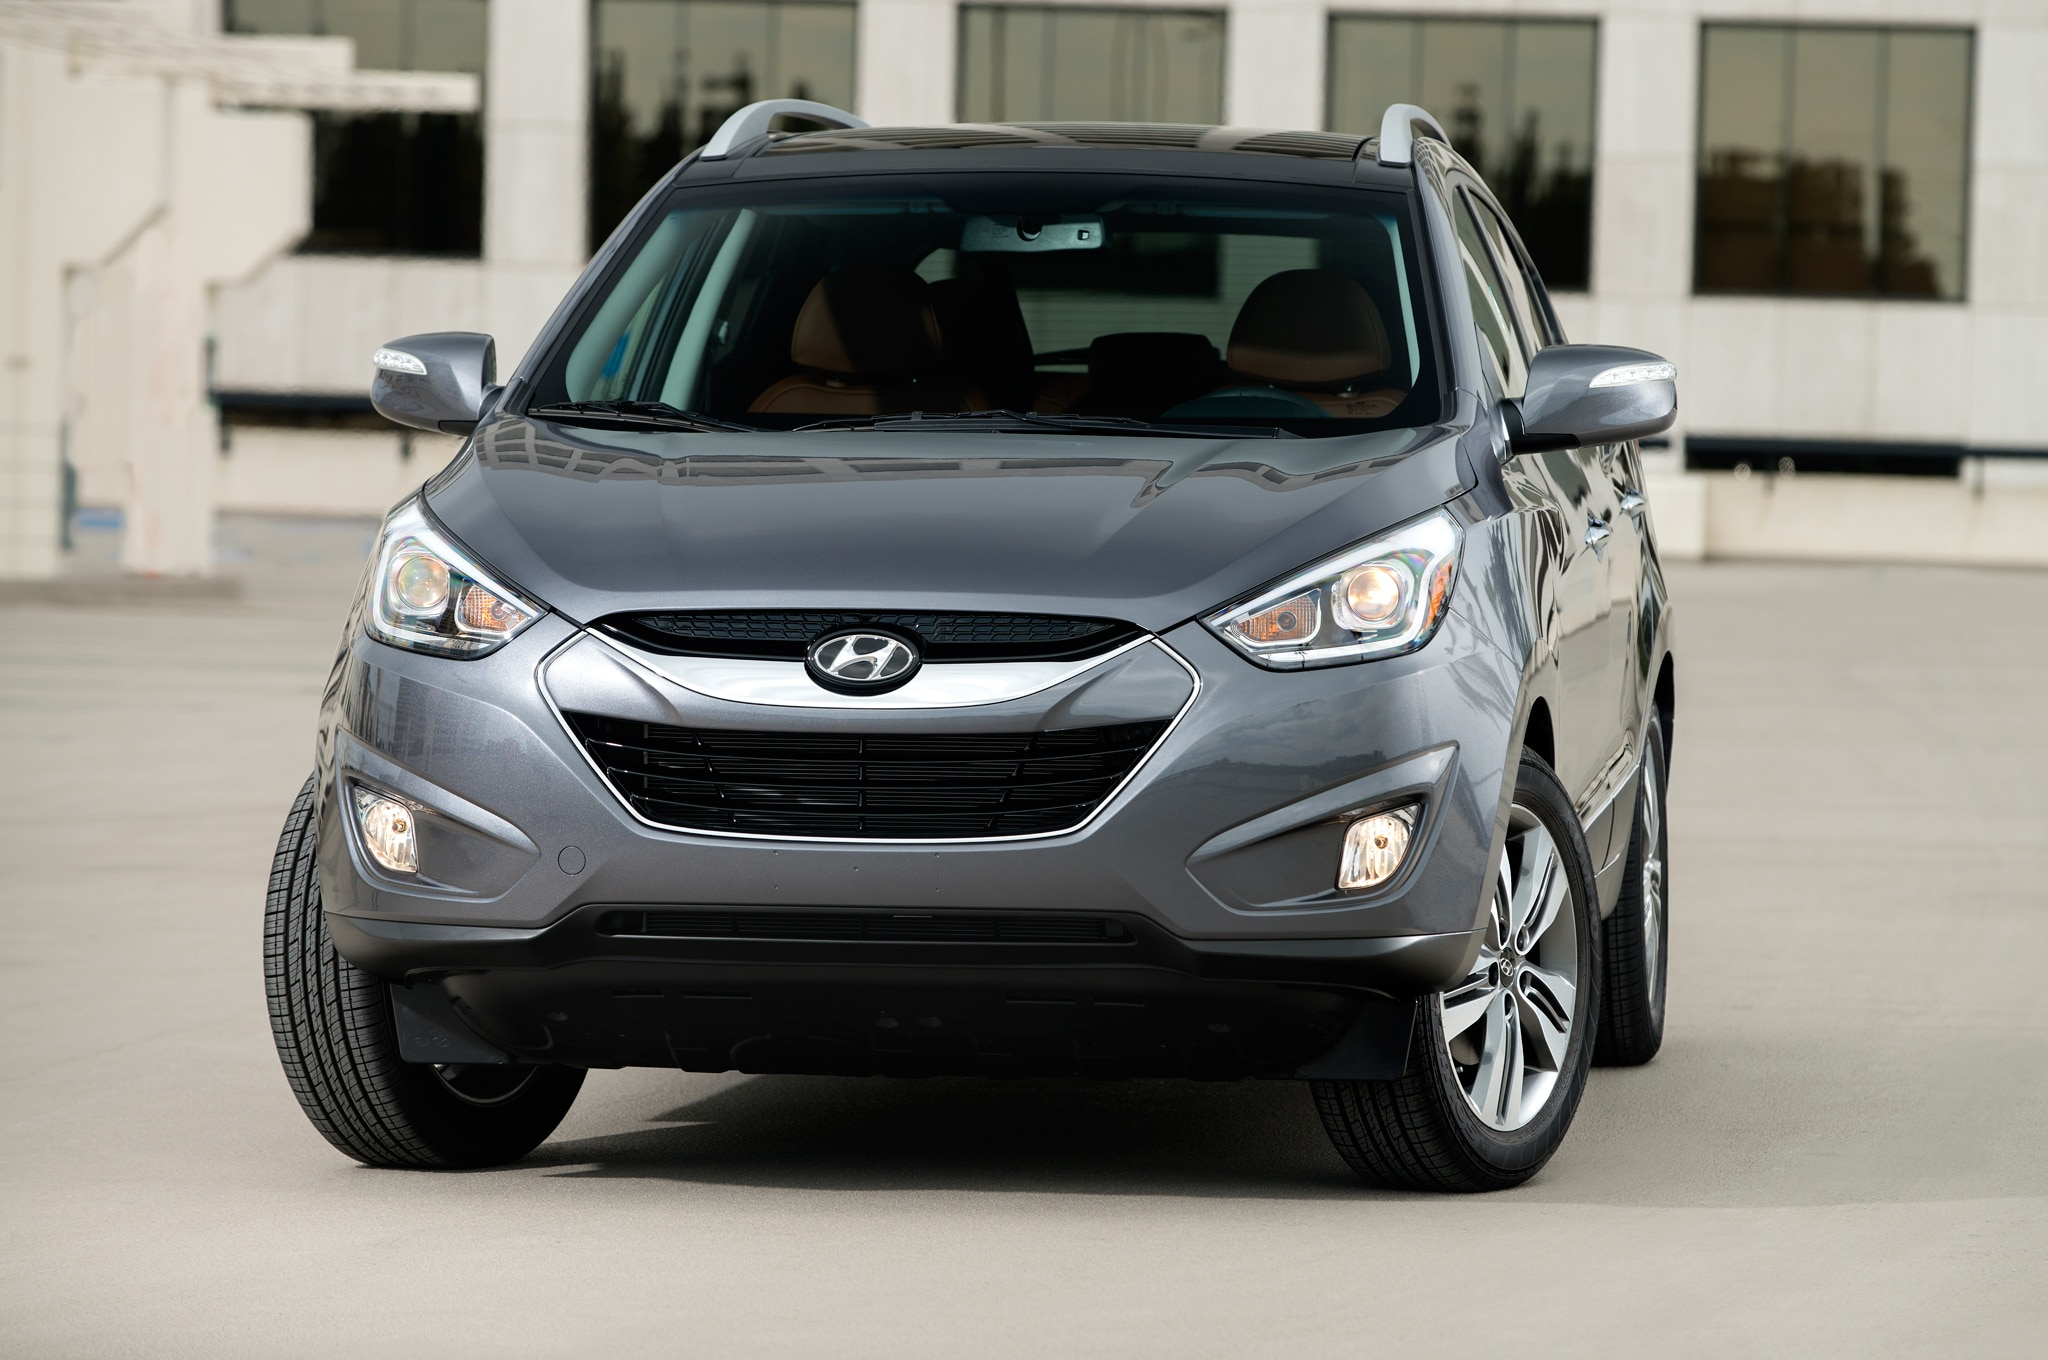 2014 Hyundai Tucson Front 21